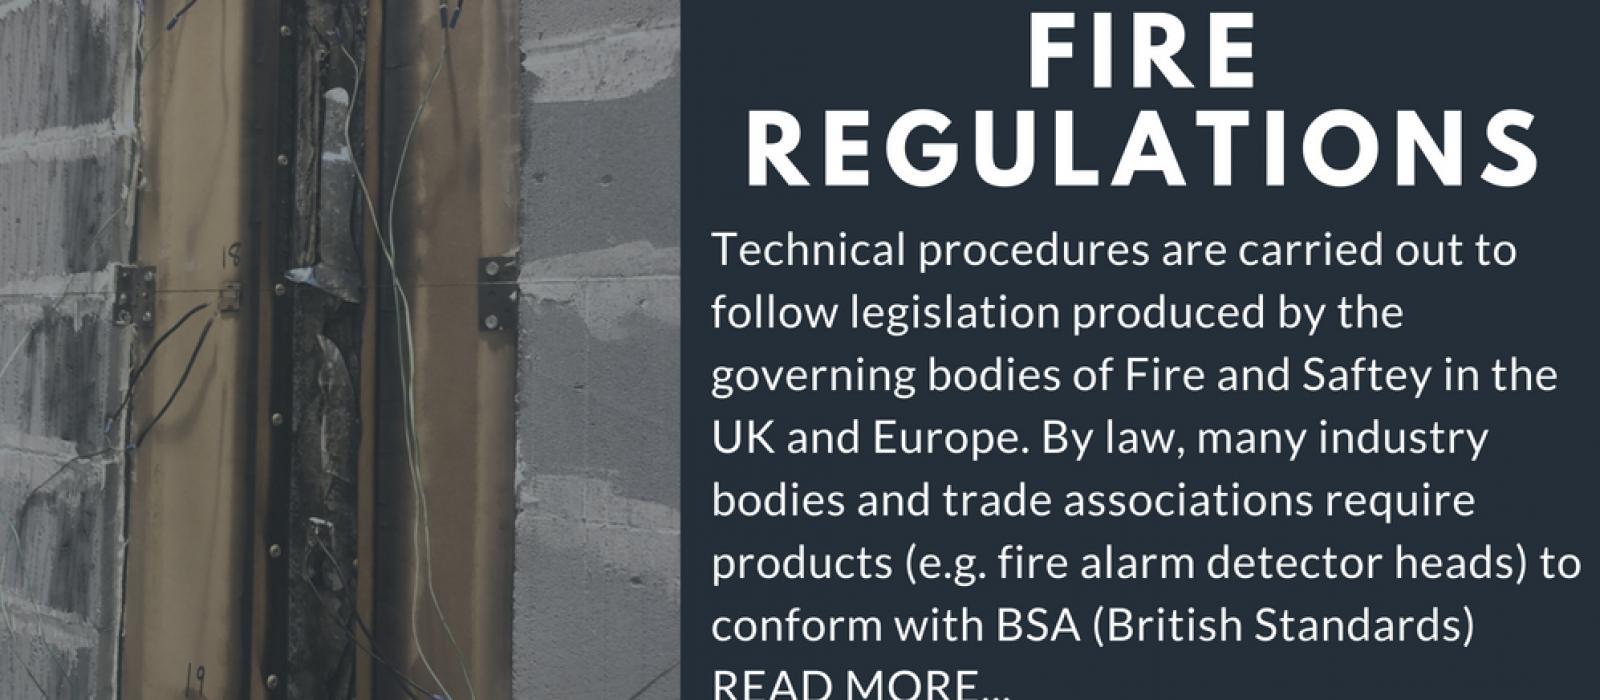 Importance of Fire Regulations